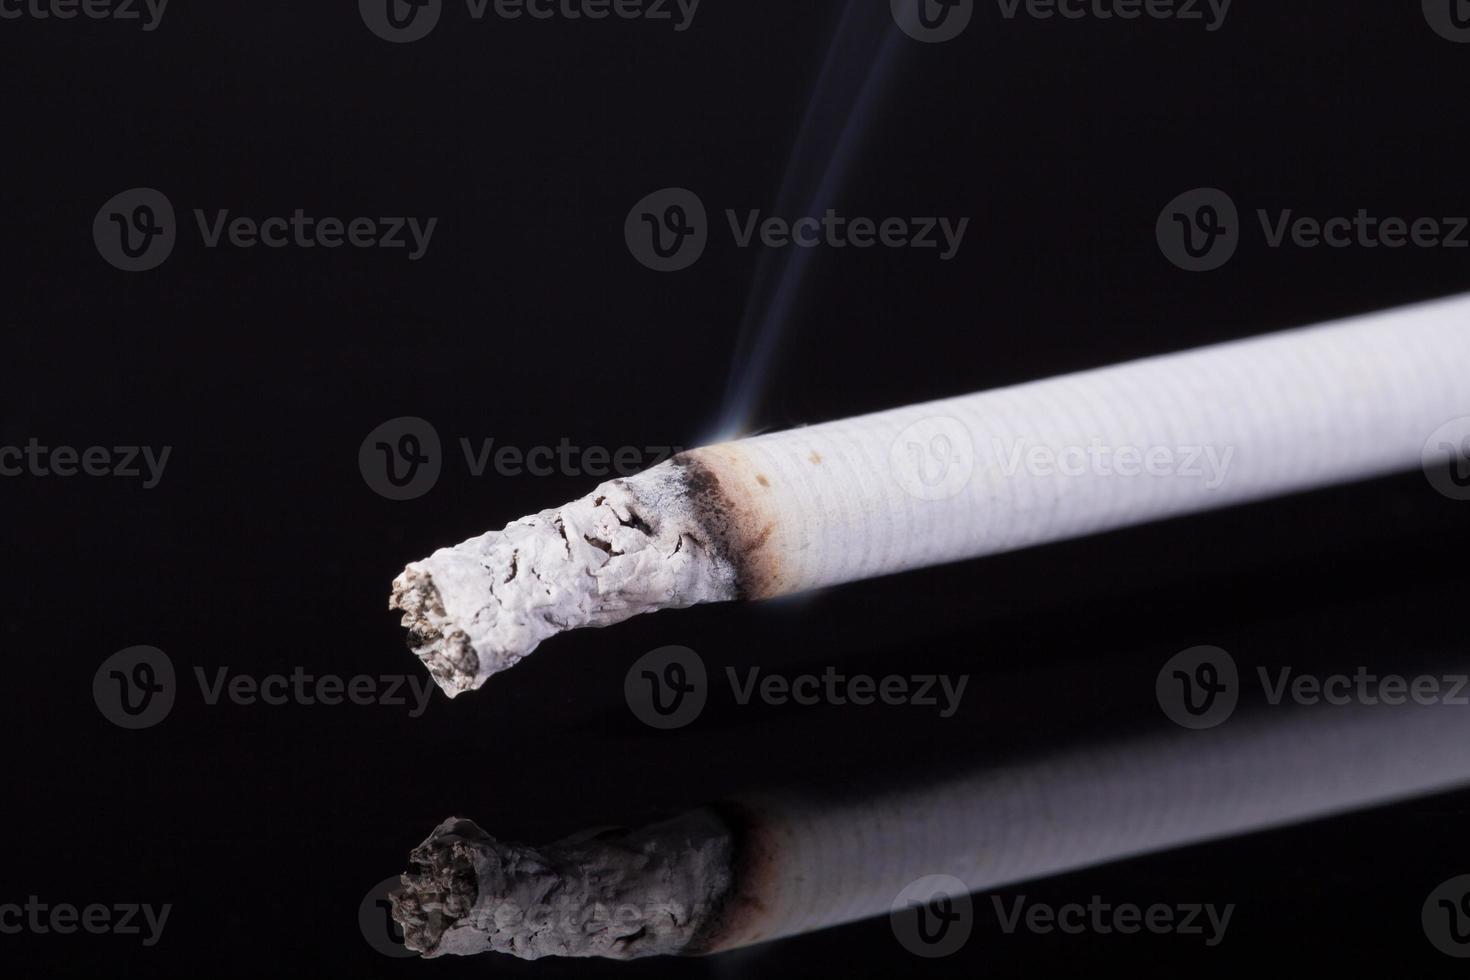 lit single cigarette with smoke  on black background photo